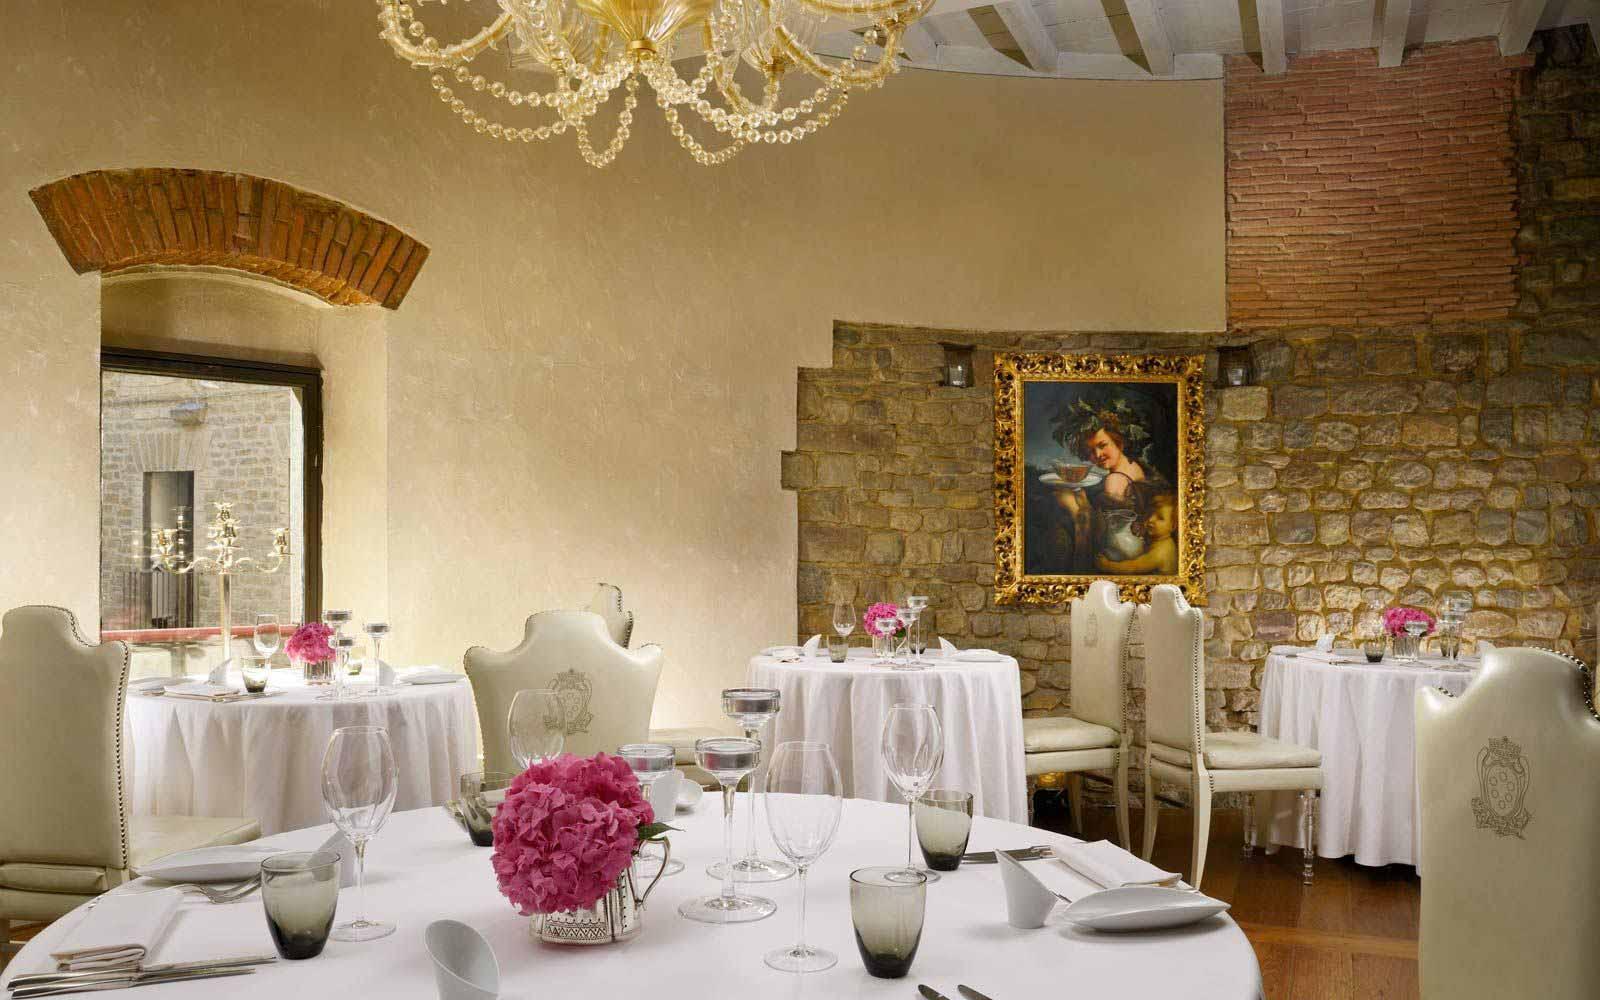 Santa Elisabetta restaurant at Hotel Brunelleschi